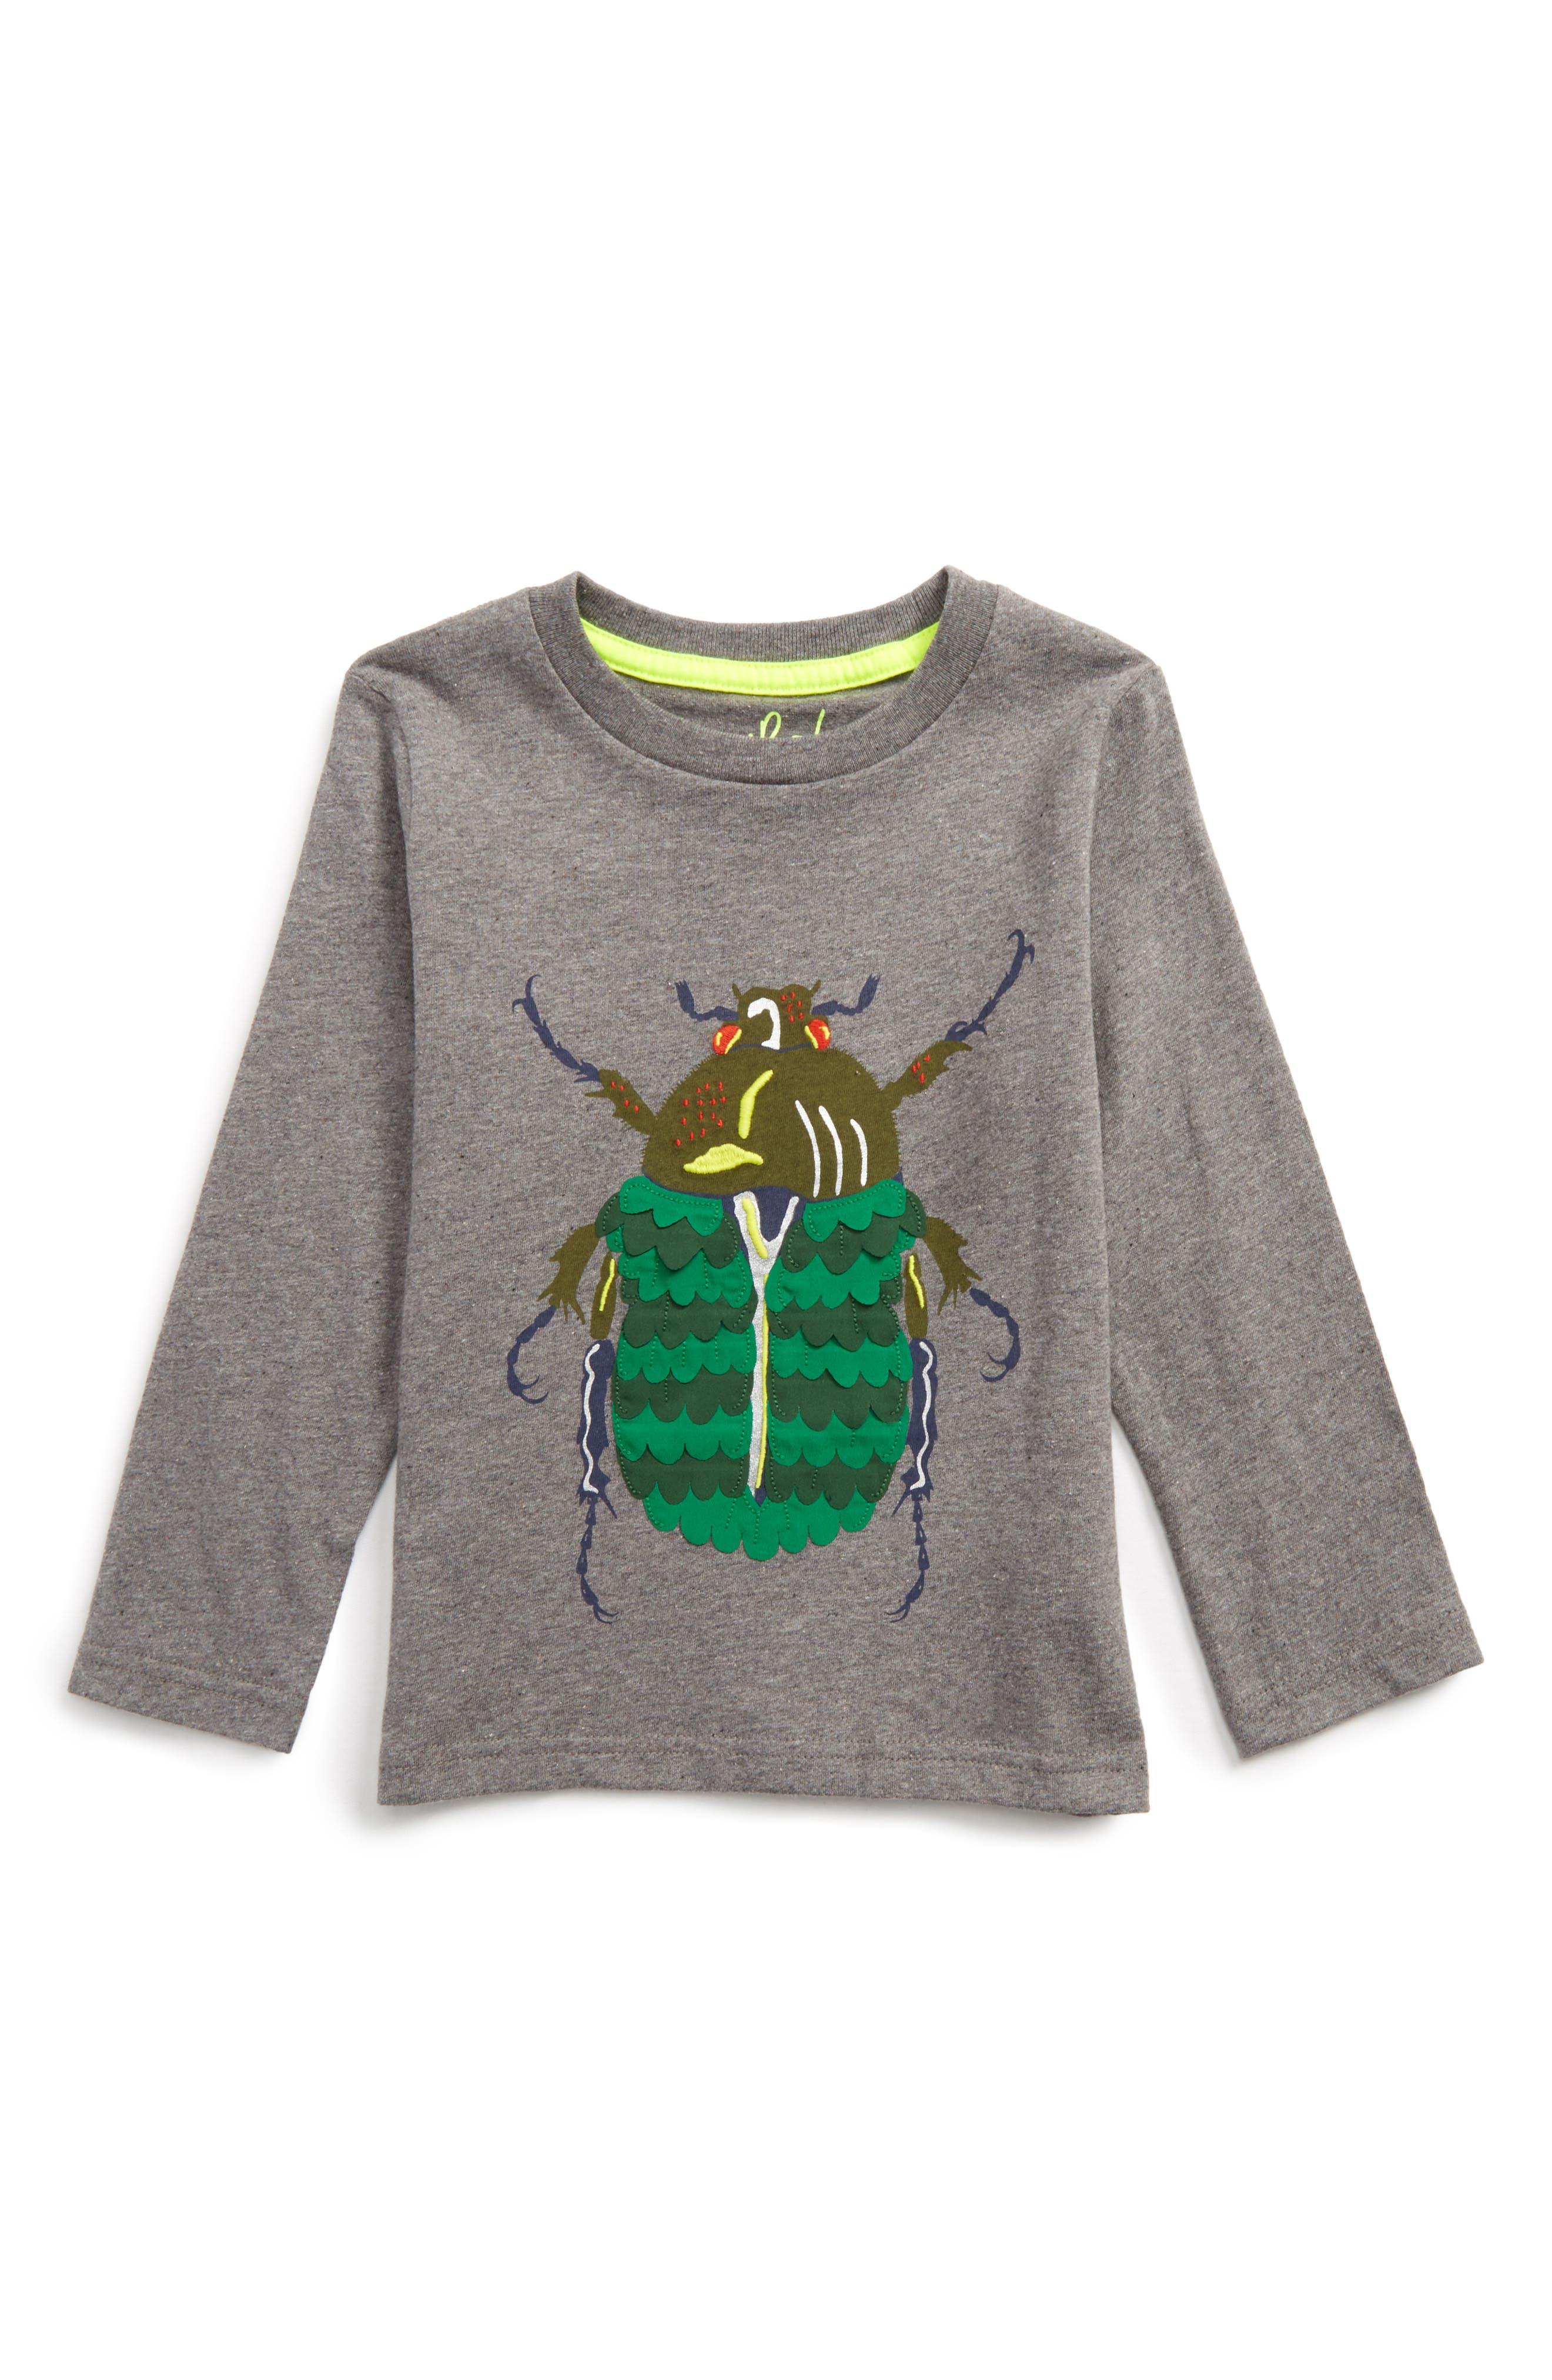 Main Image - Mini Boden Textured Creature T-Shirt (Toddler Boys, Little Boys & Big Boys)